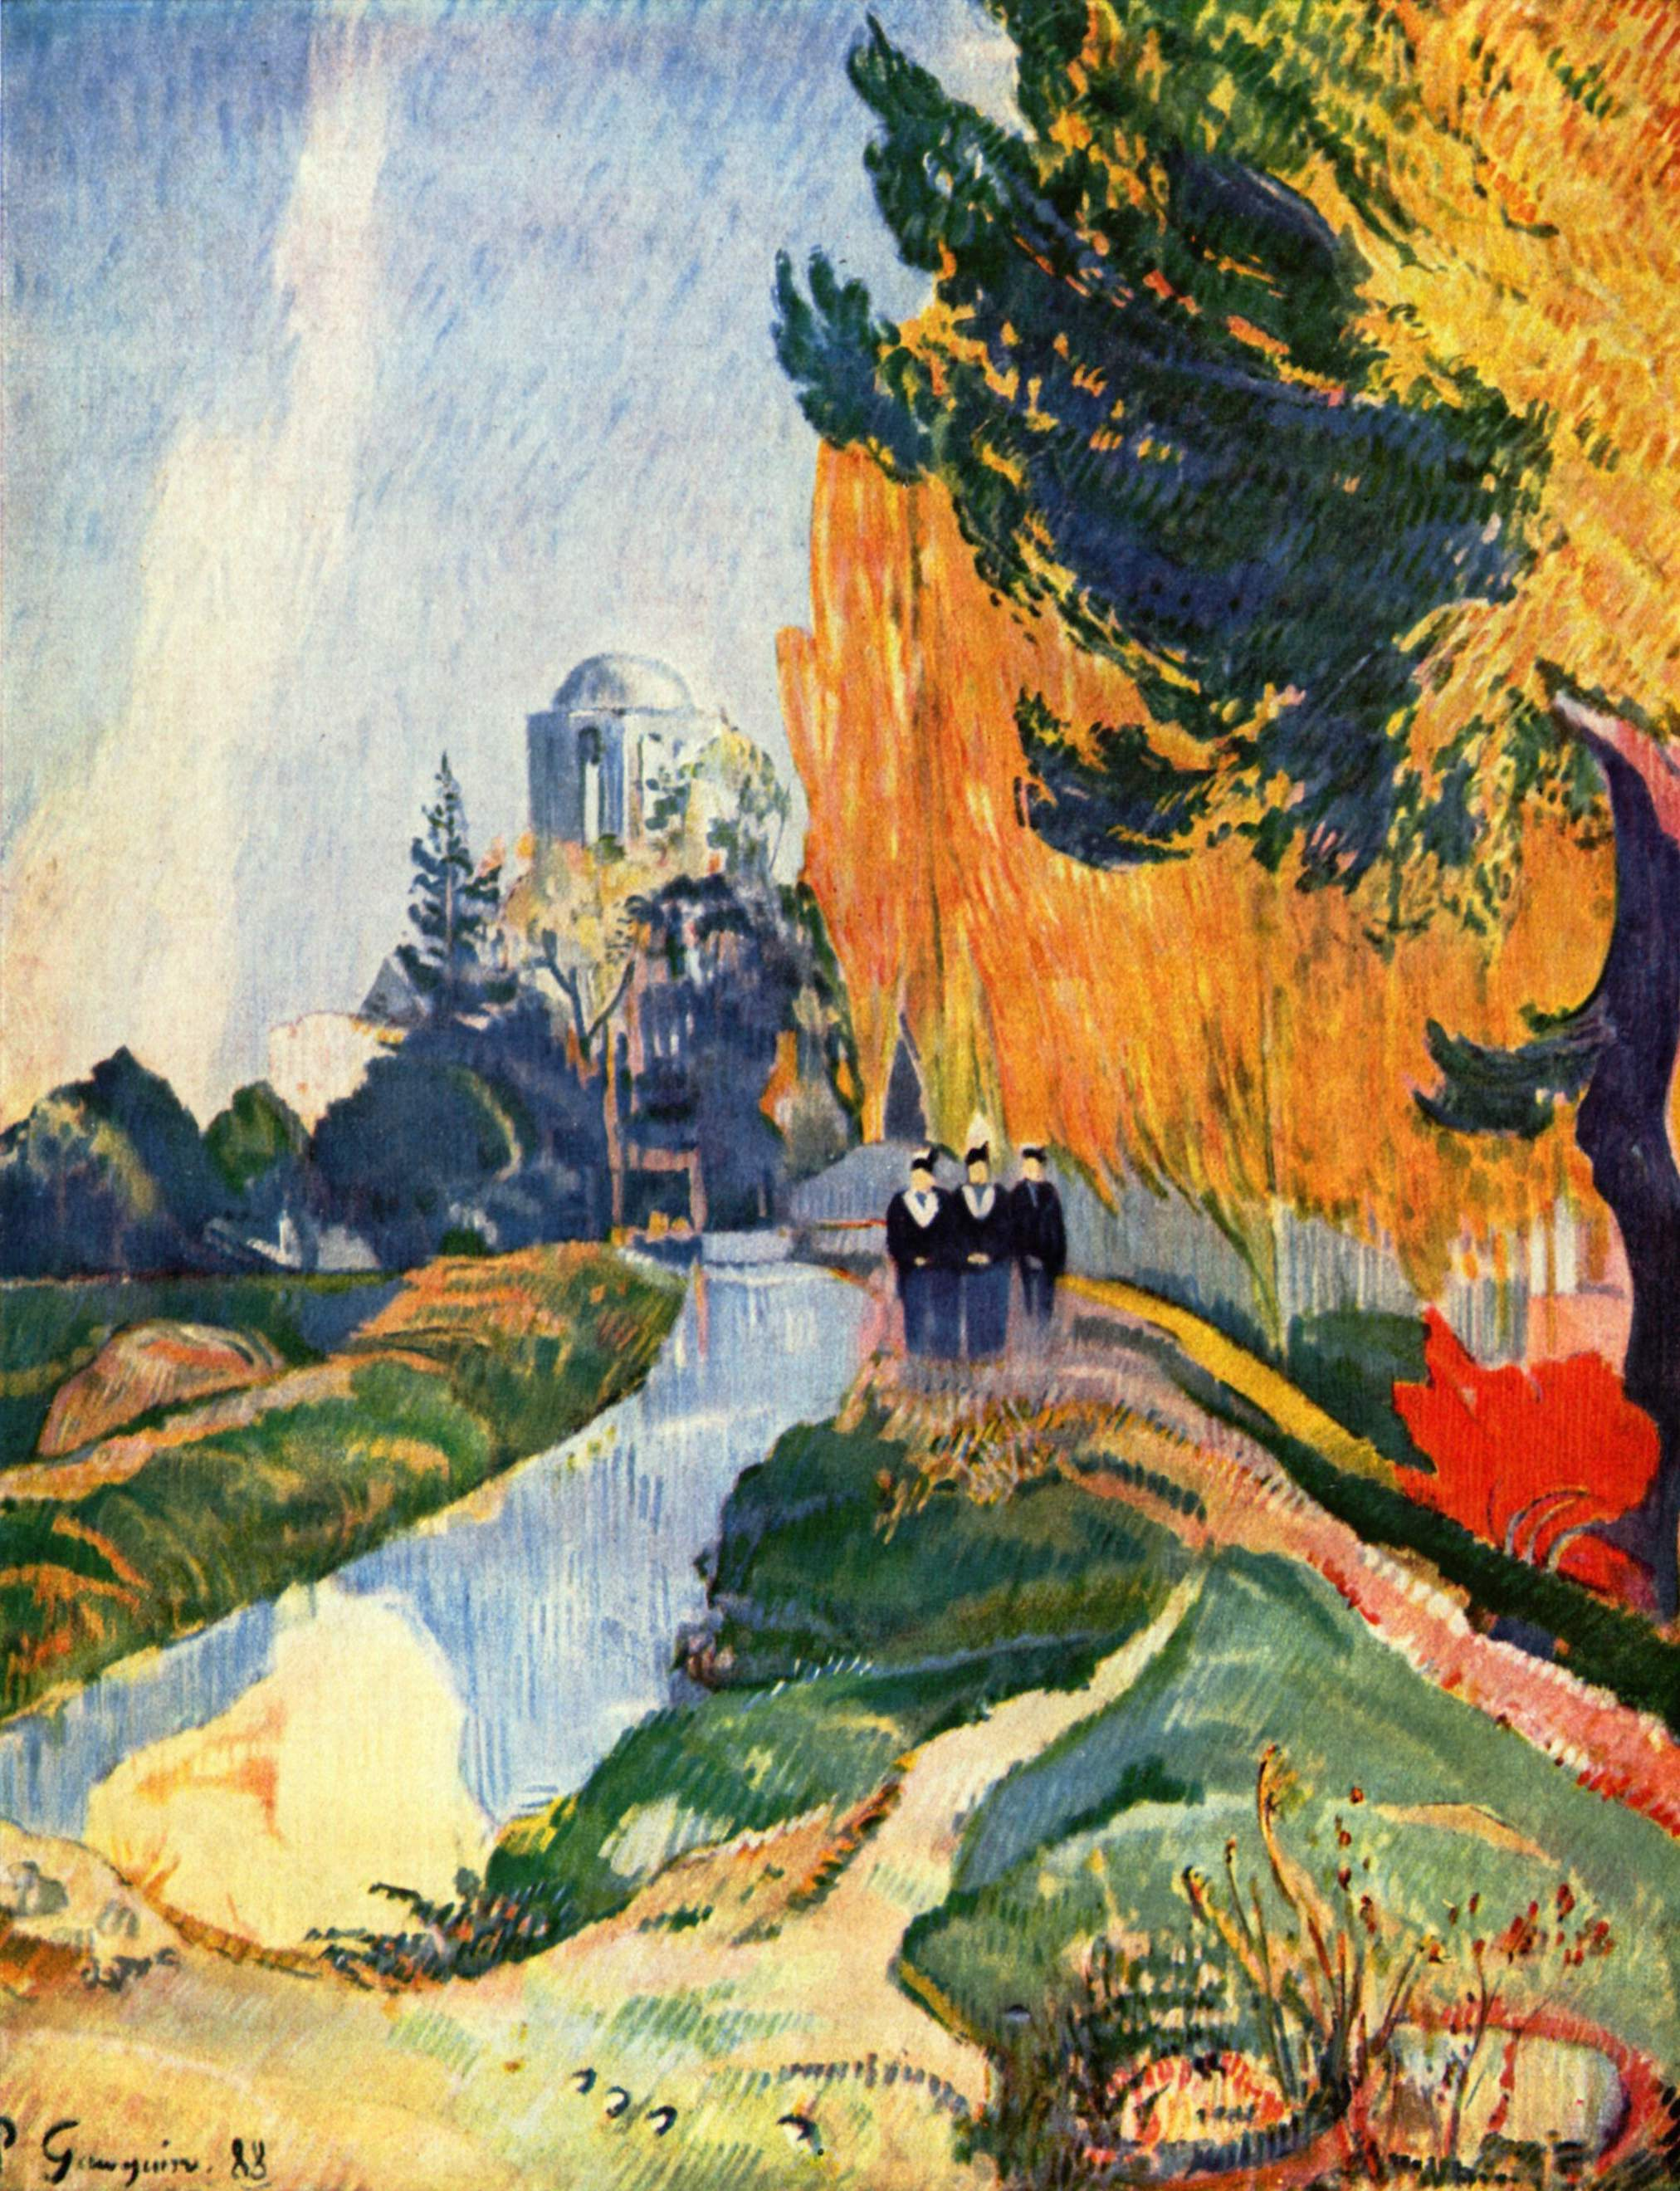 File:Paul Gauguin 085.jpg - Wikimedia Commons